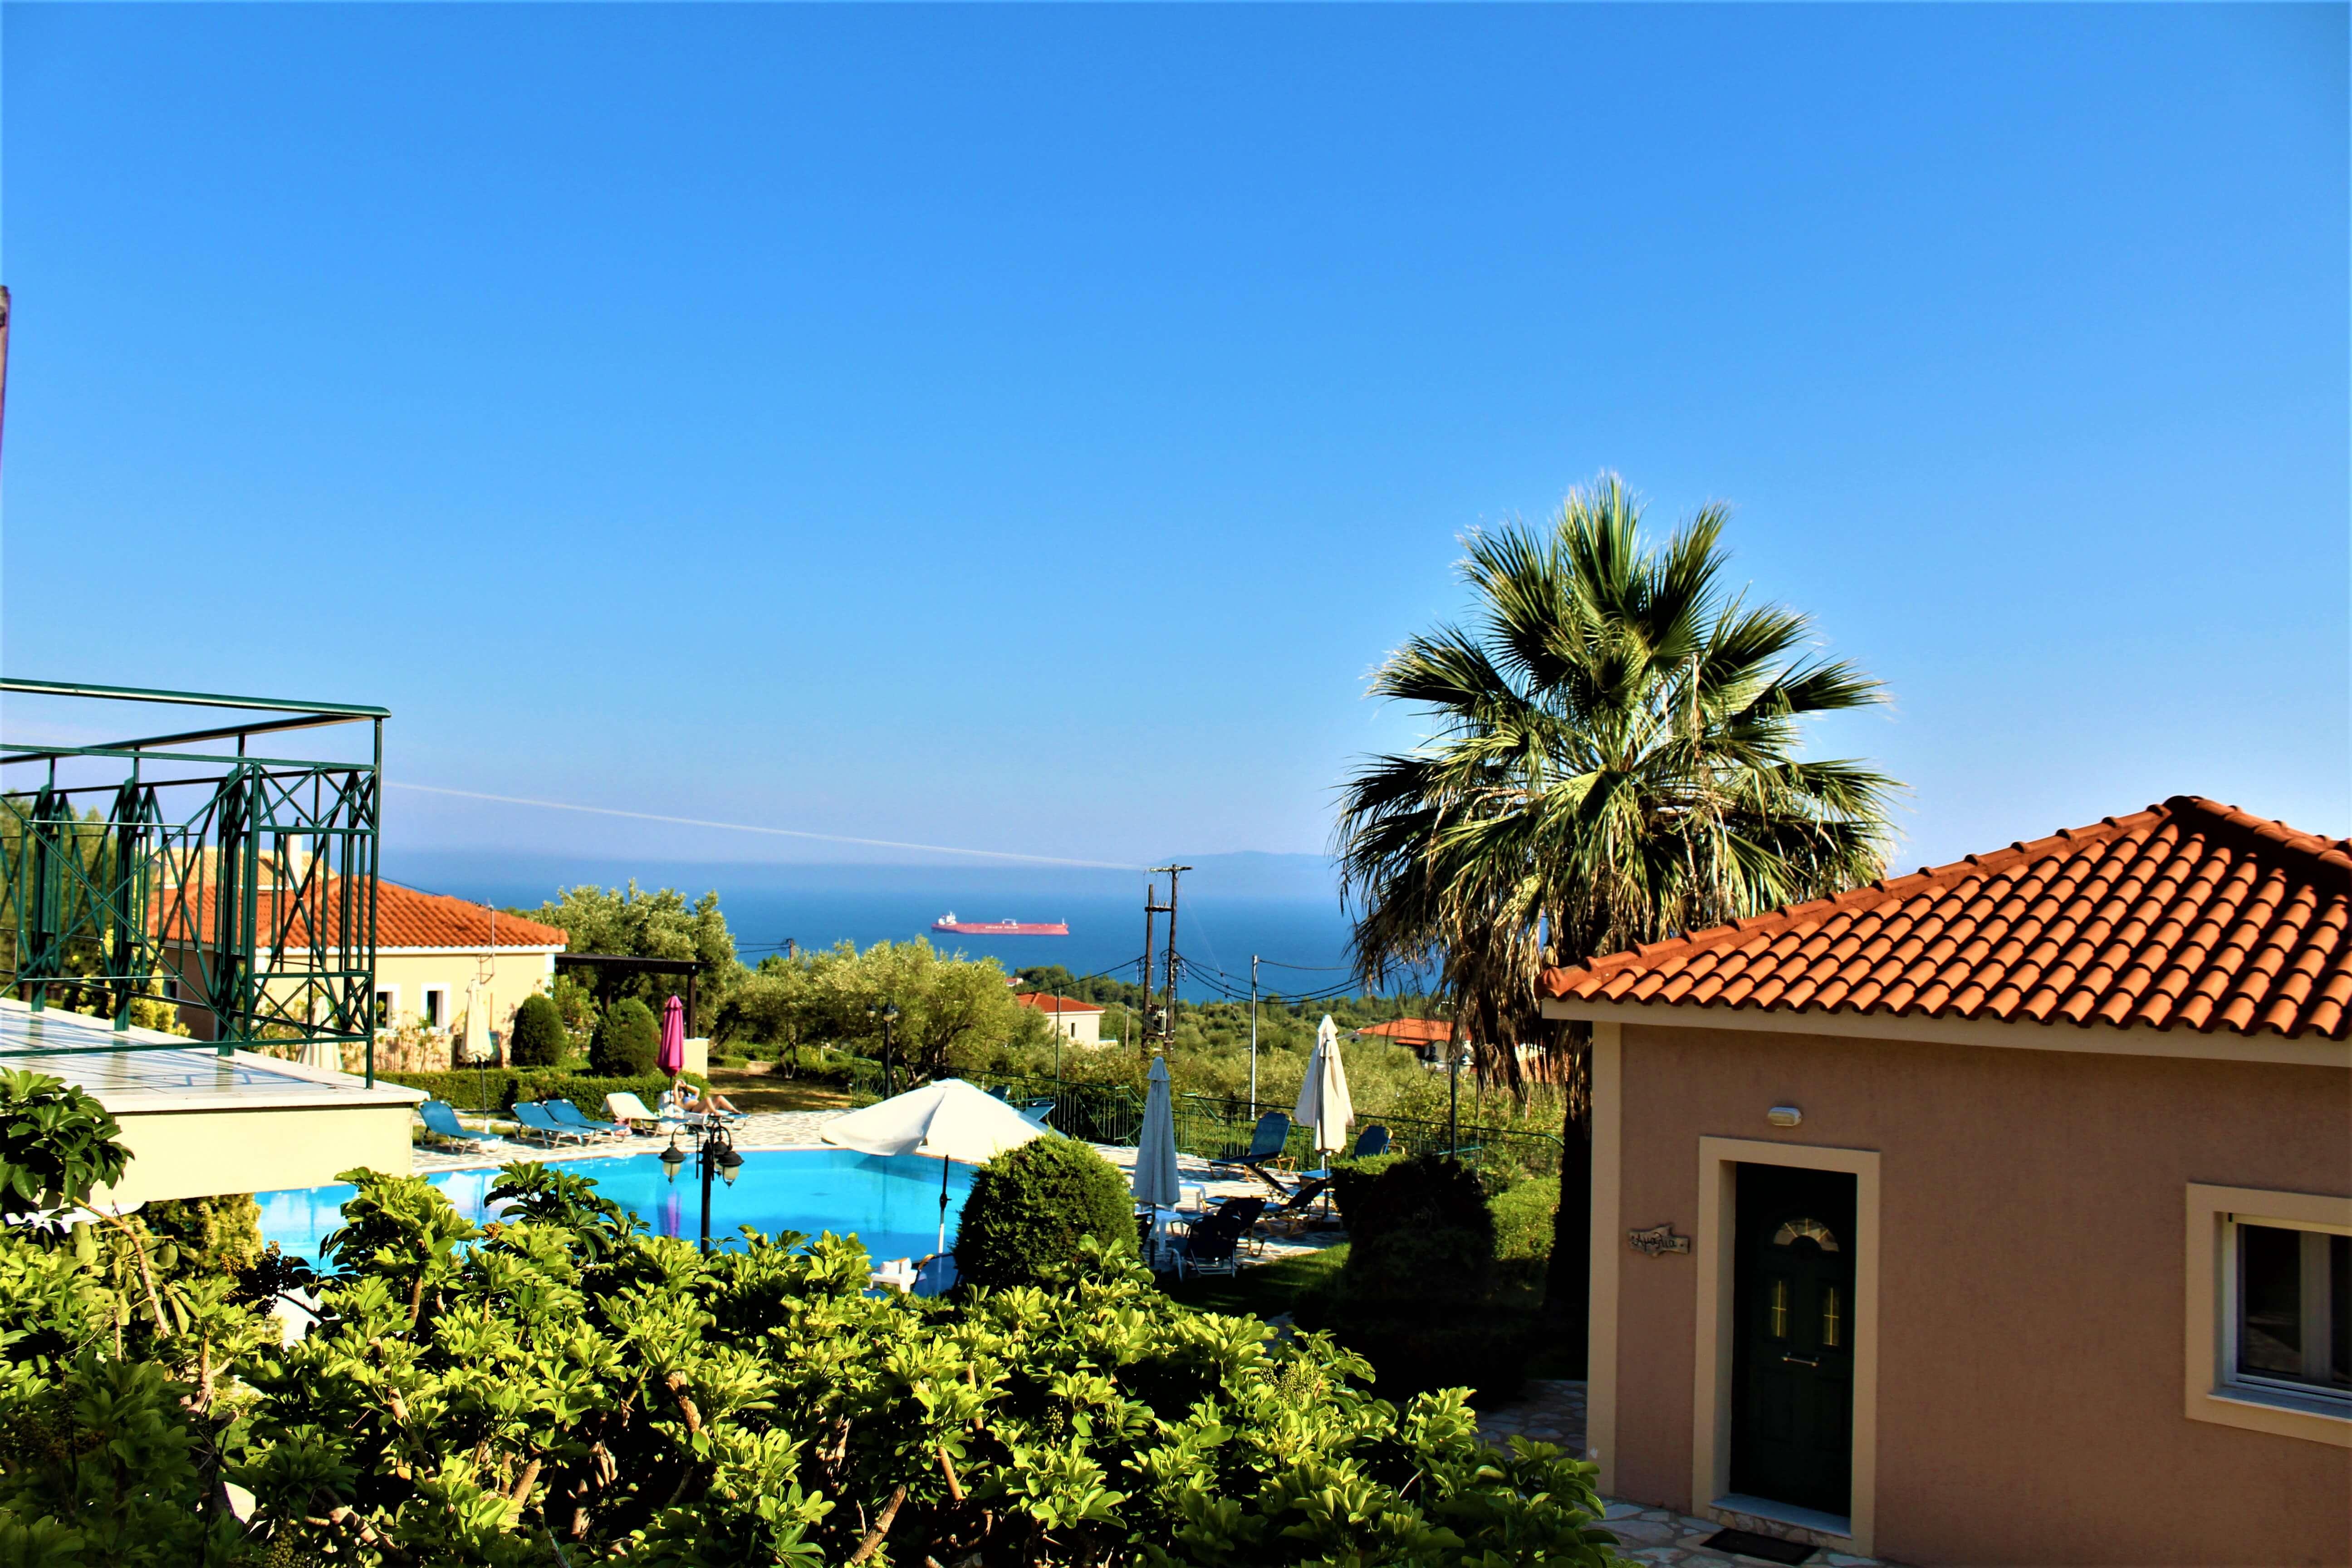 Oneira Villas Kefalonia Balcony view